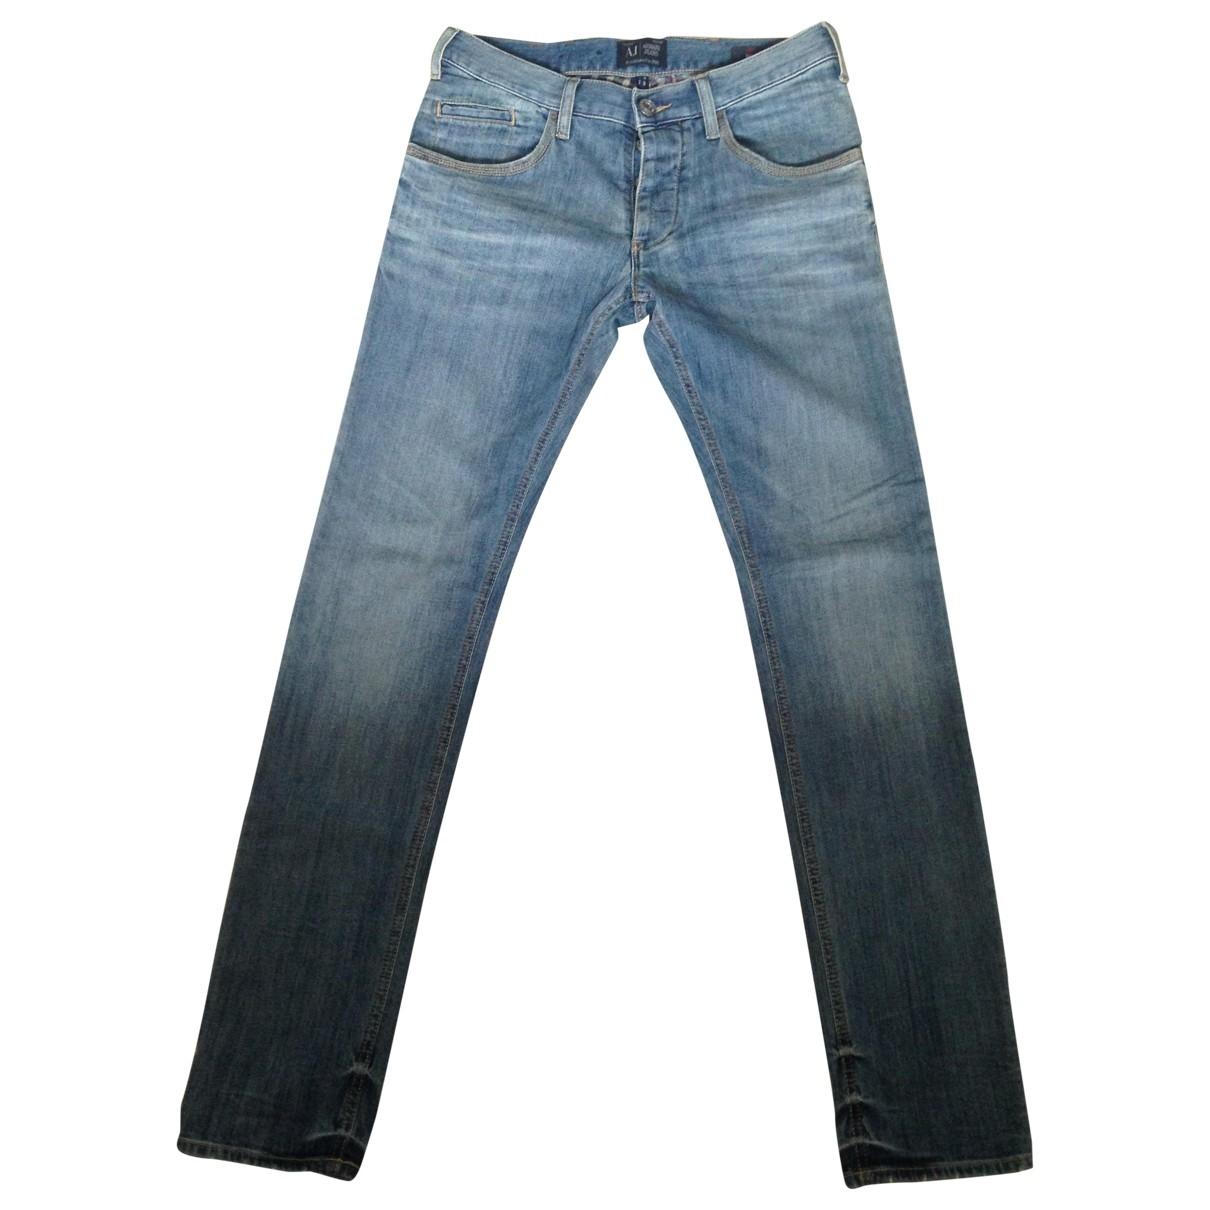 Armani Jeans \N Blue Cotton - elasthane Jeans for Men 29 US